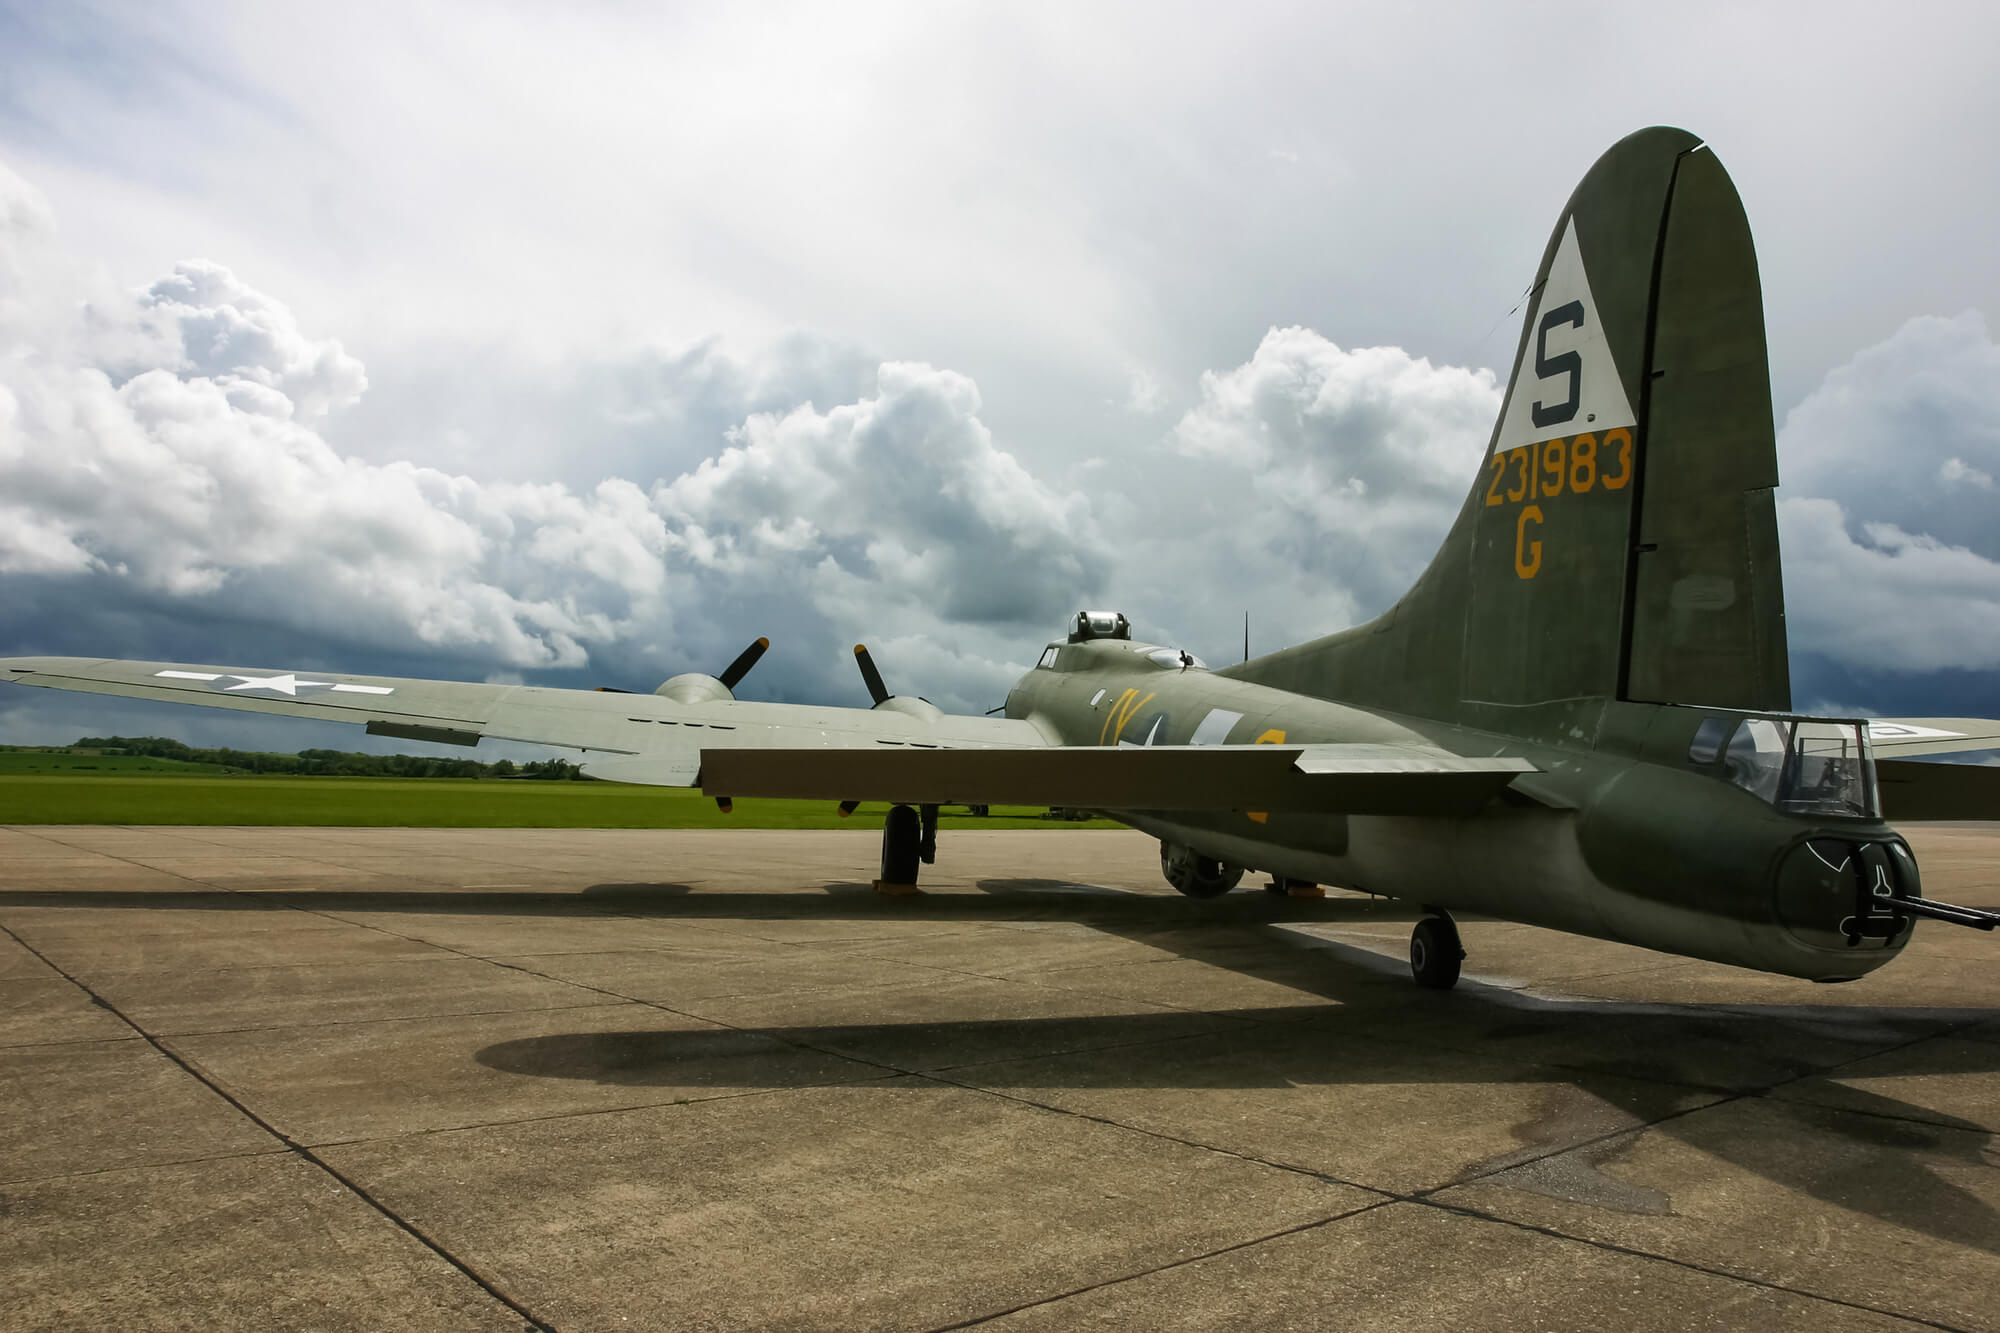 B 17 Flying Fortress Wallpaper B17 Flying Fortress Wa...